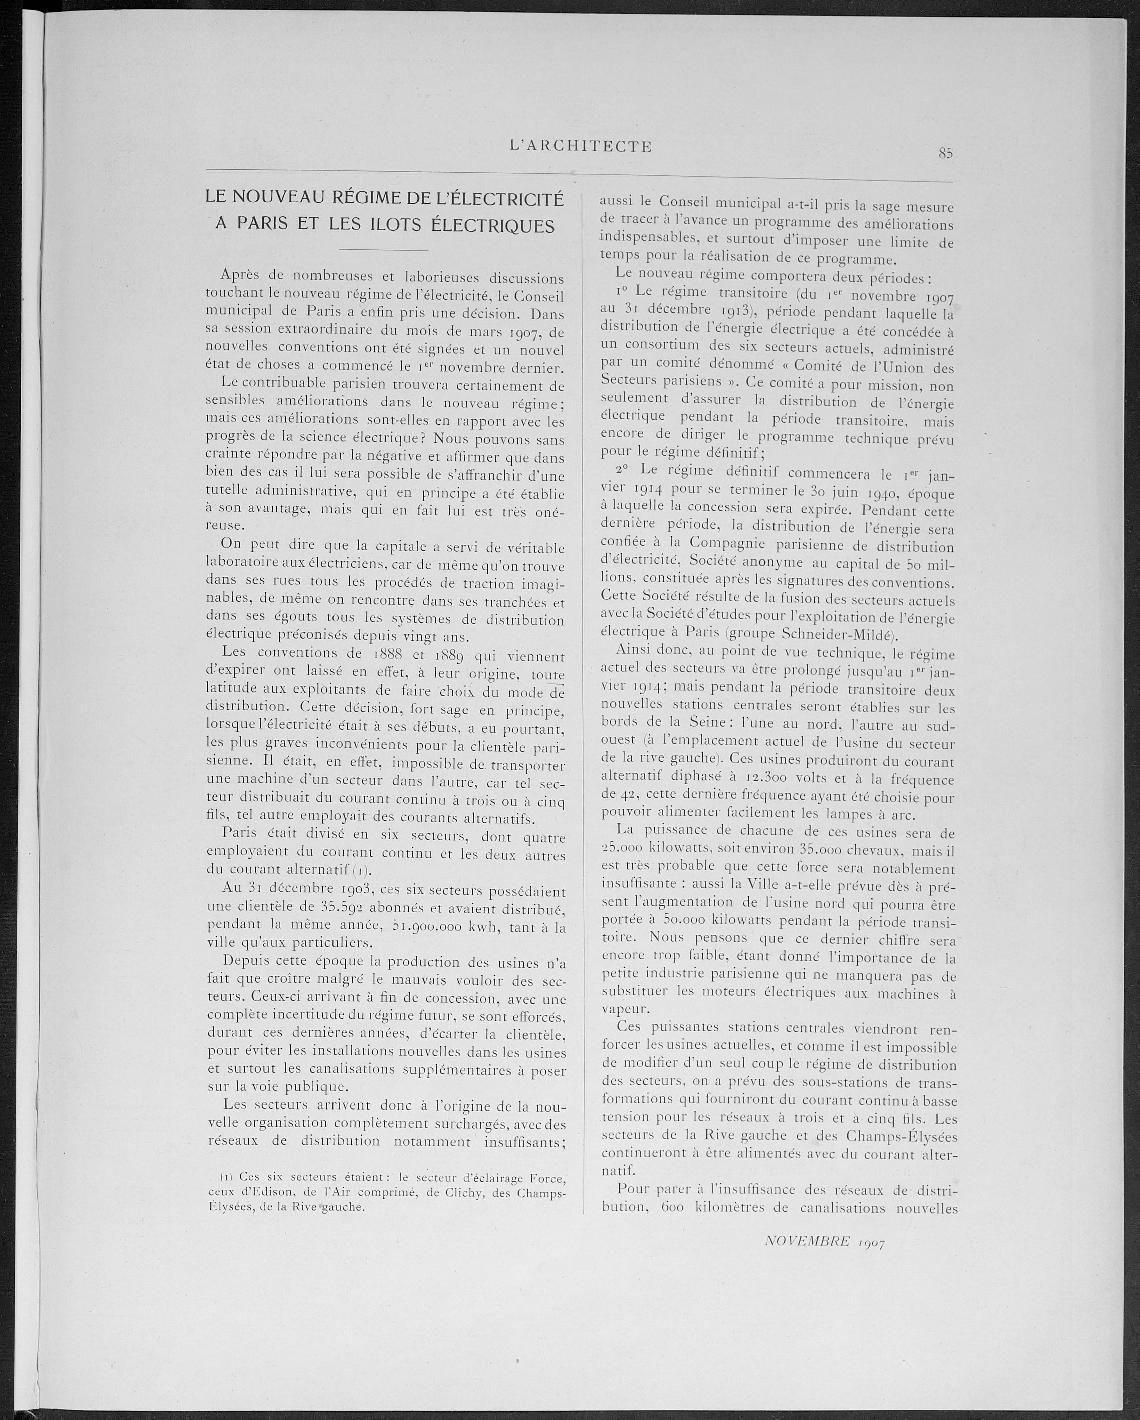 L'Architecte, no. 11, 1907 |